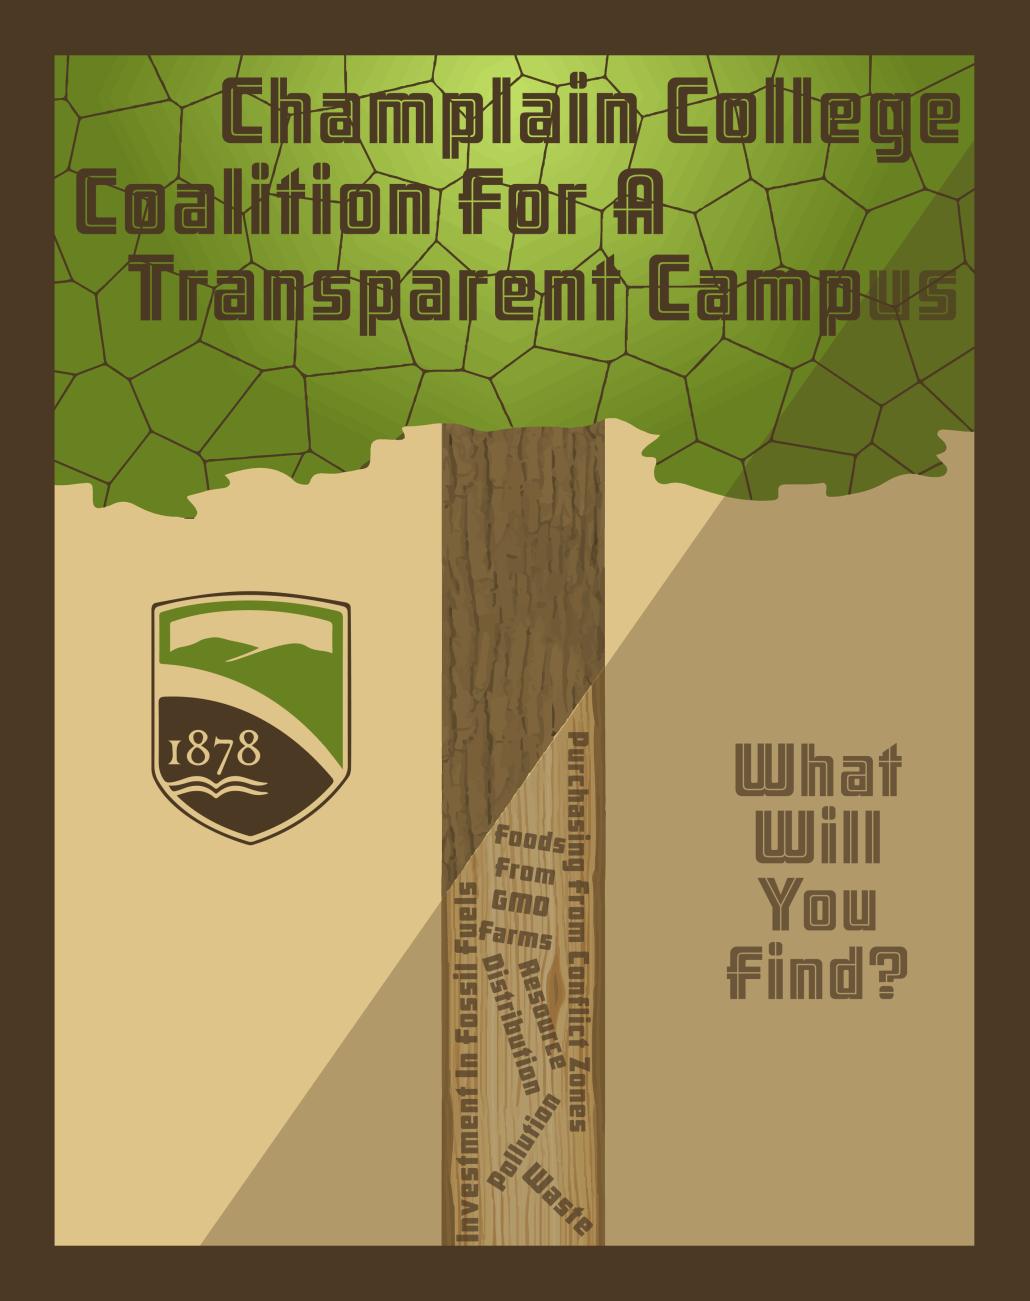 Champlain Transparent Campus